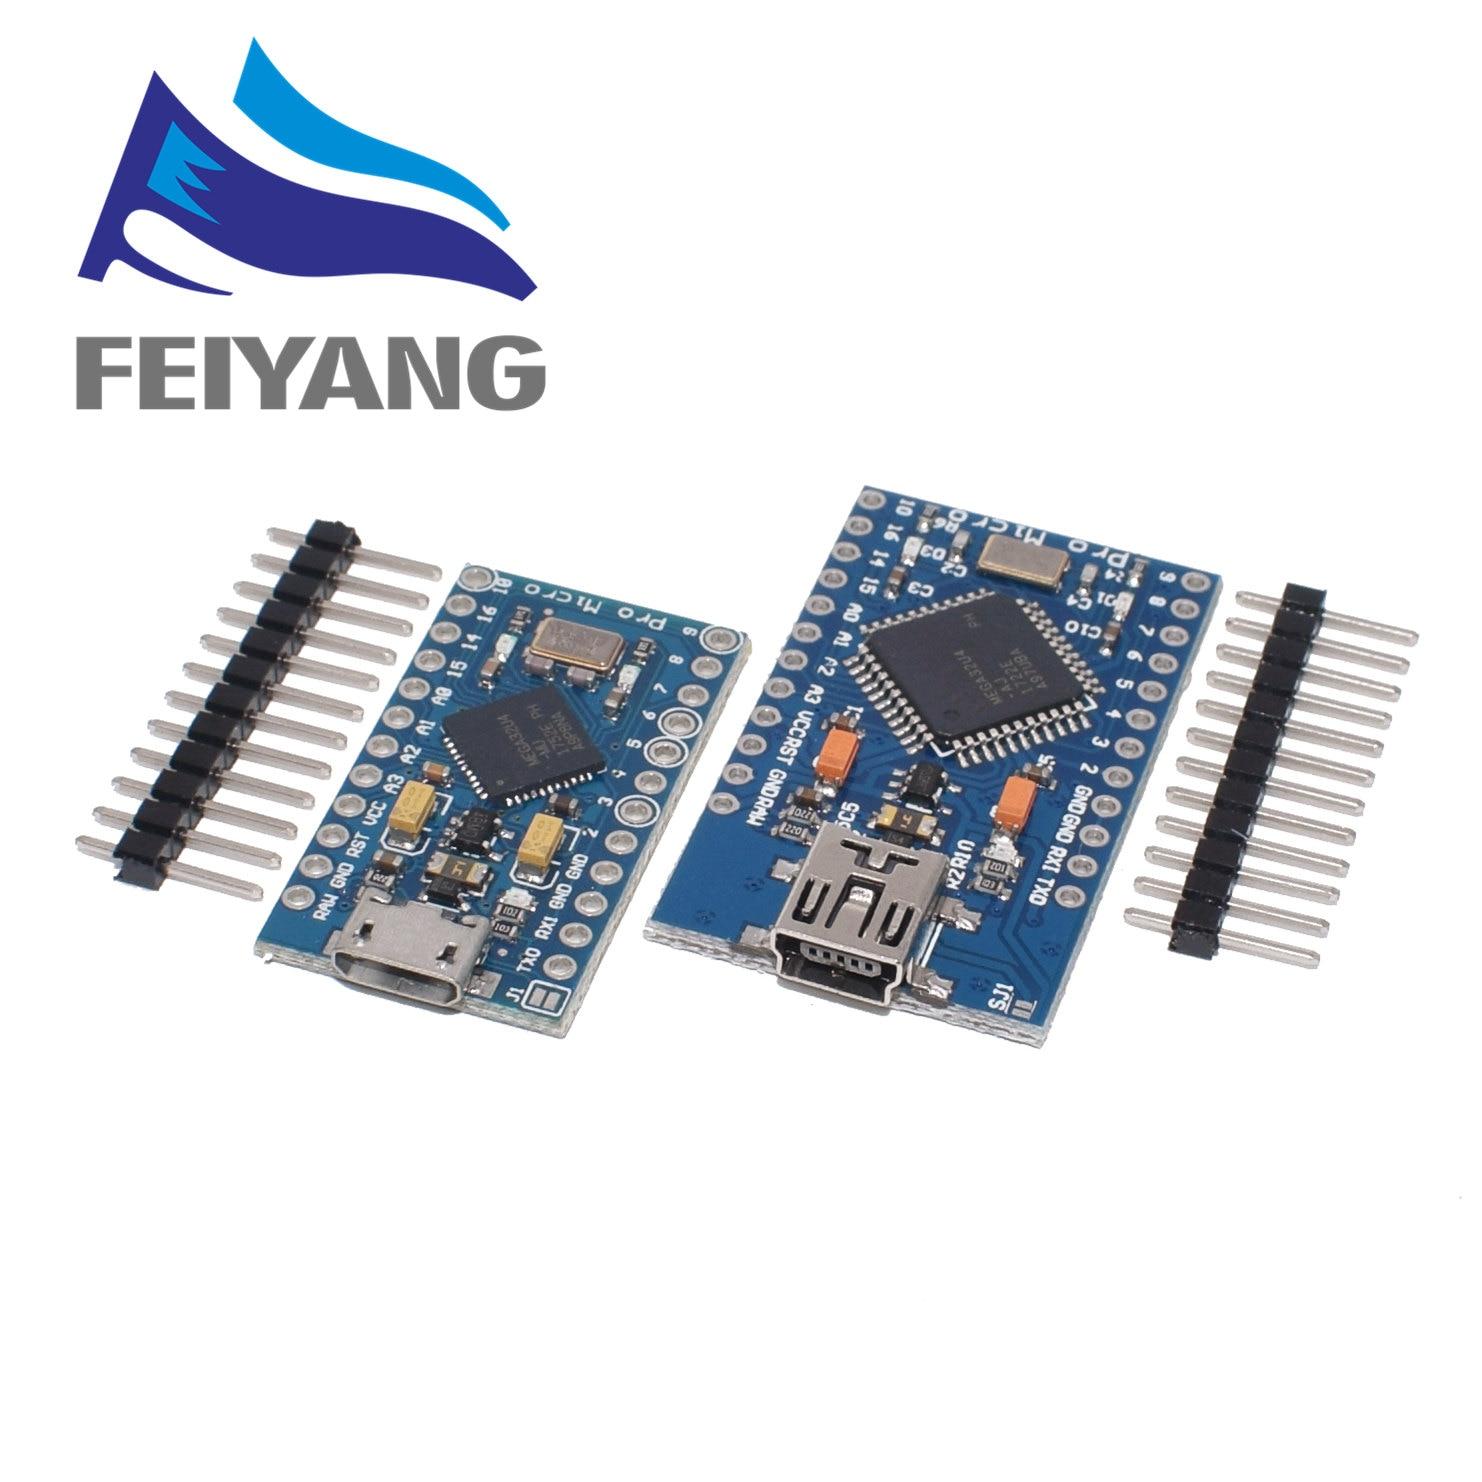 100PCS Pro Micro ATmega32U4 5V 16MHz Replace ATmega328 For arduino ATMega 32U4 Pro Mini With 2